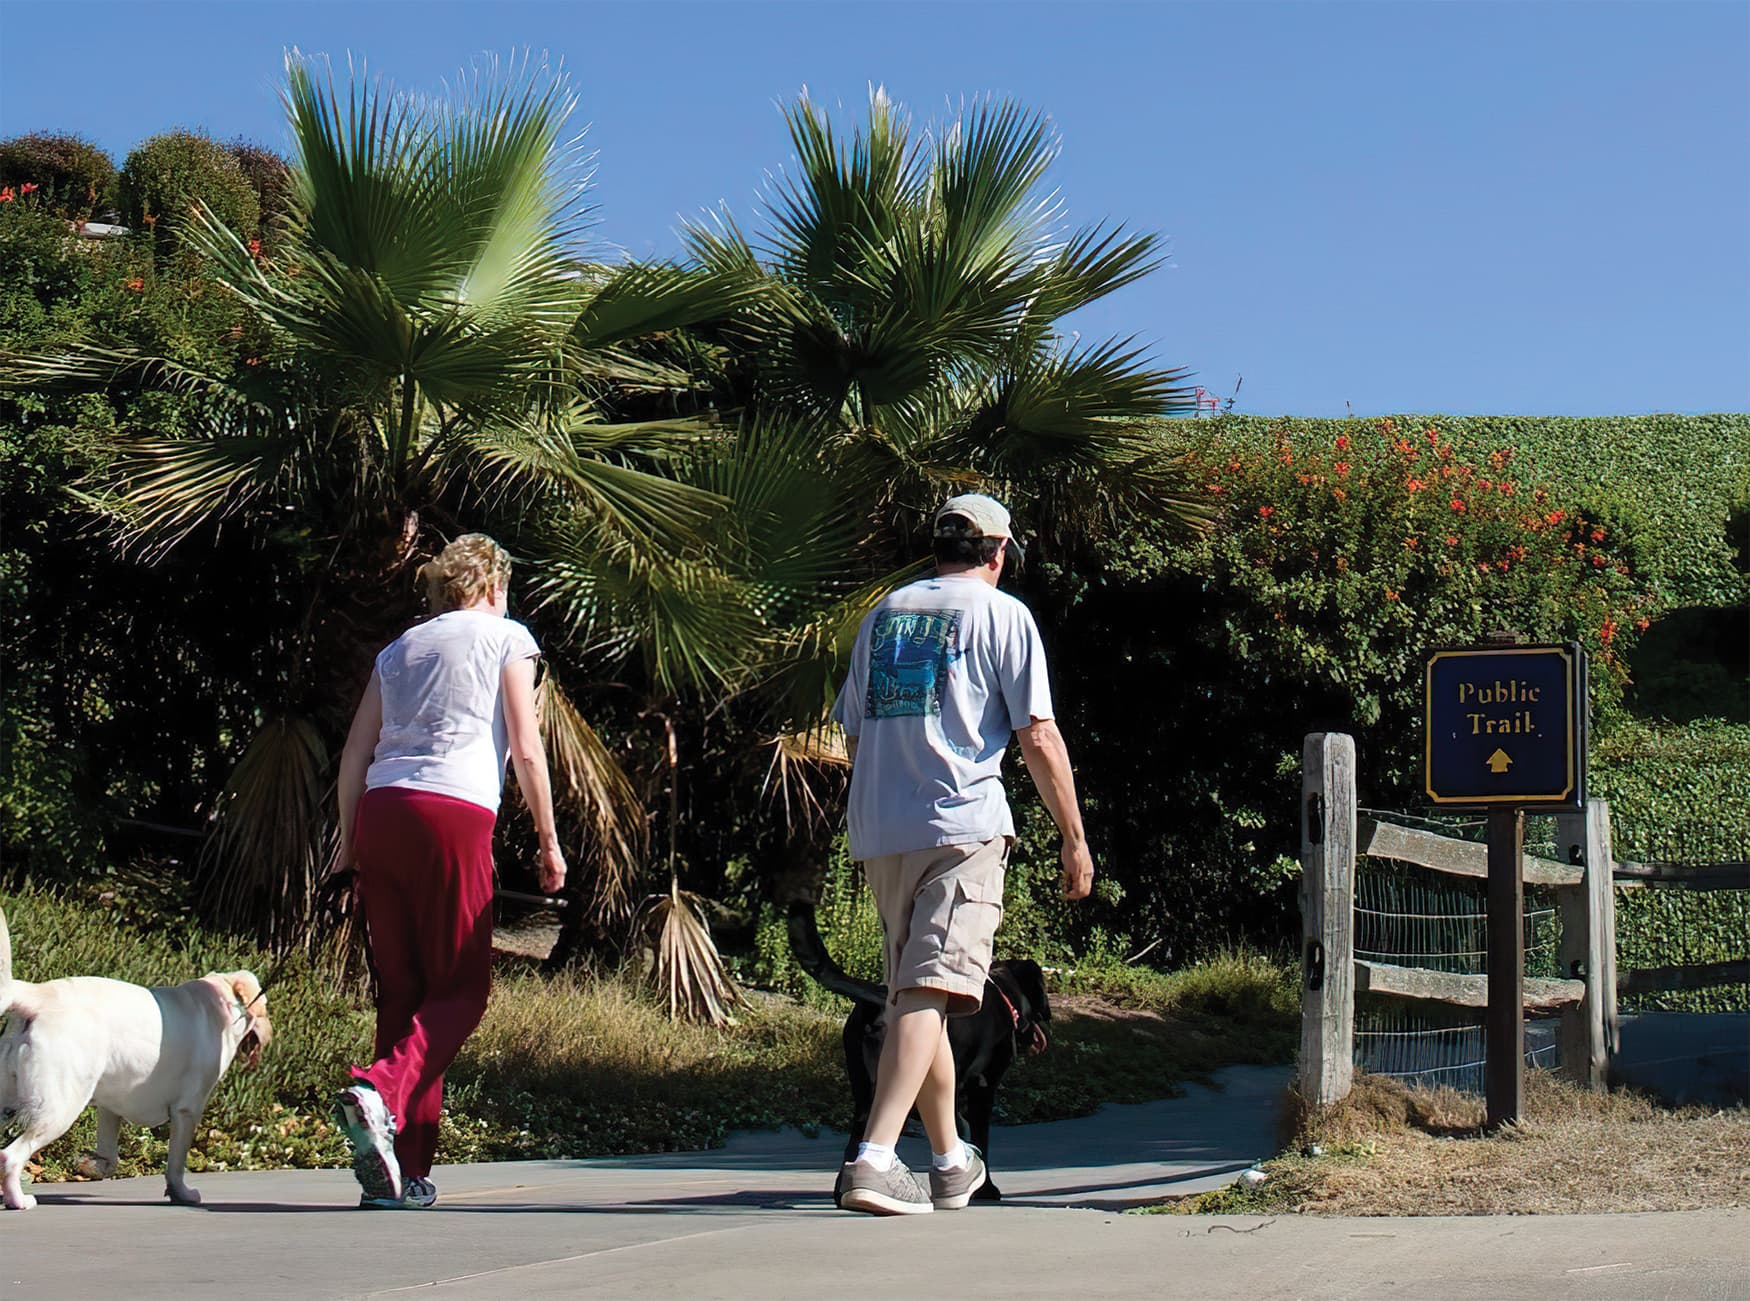 Monarch Beach Masterplan. City of Dana Point, California. Civic Design, Residential Community Signage, Park Wayfinding & Signage. Trail Signage.